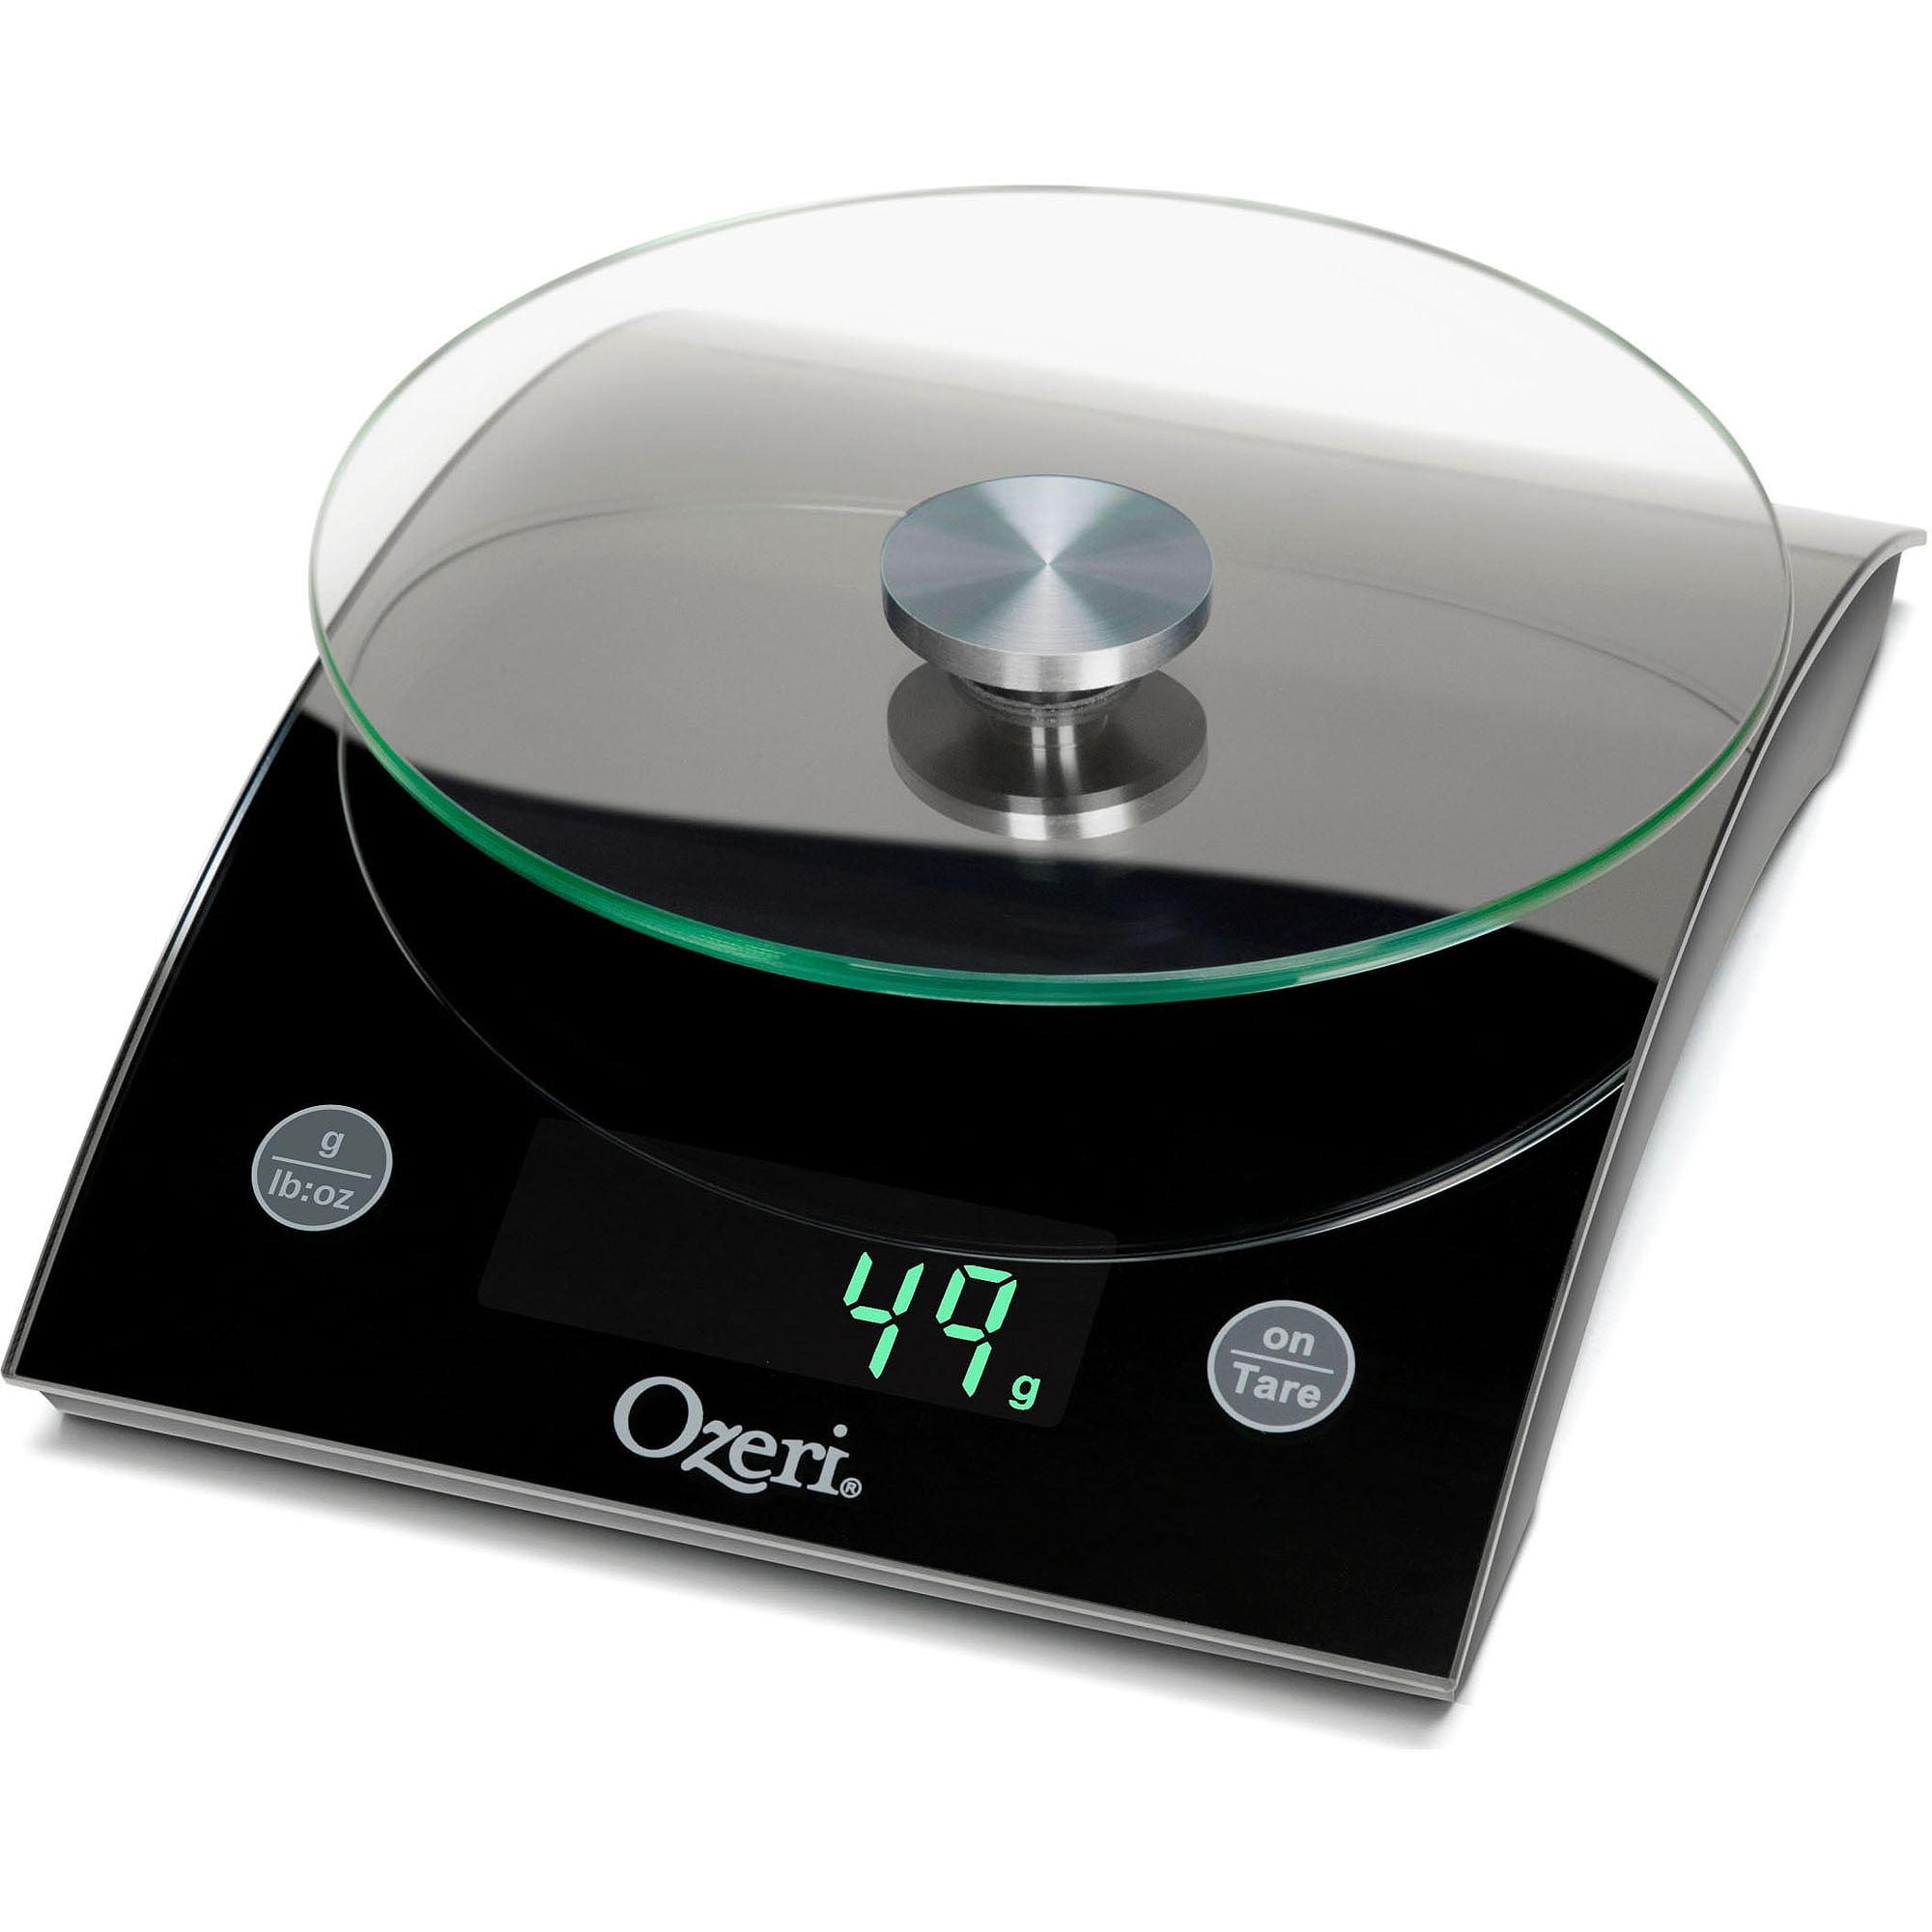 Ozeri Epicurean Digital Kitchen Scale, 17 lb Capacity, Elegant Tempered Glass